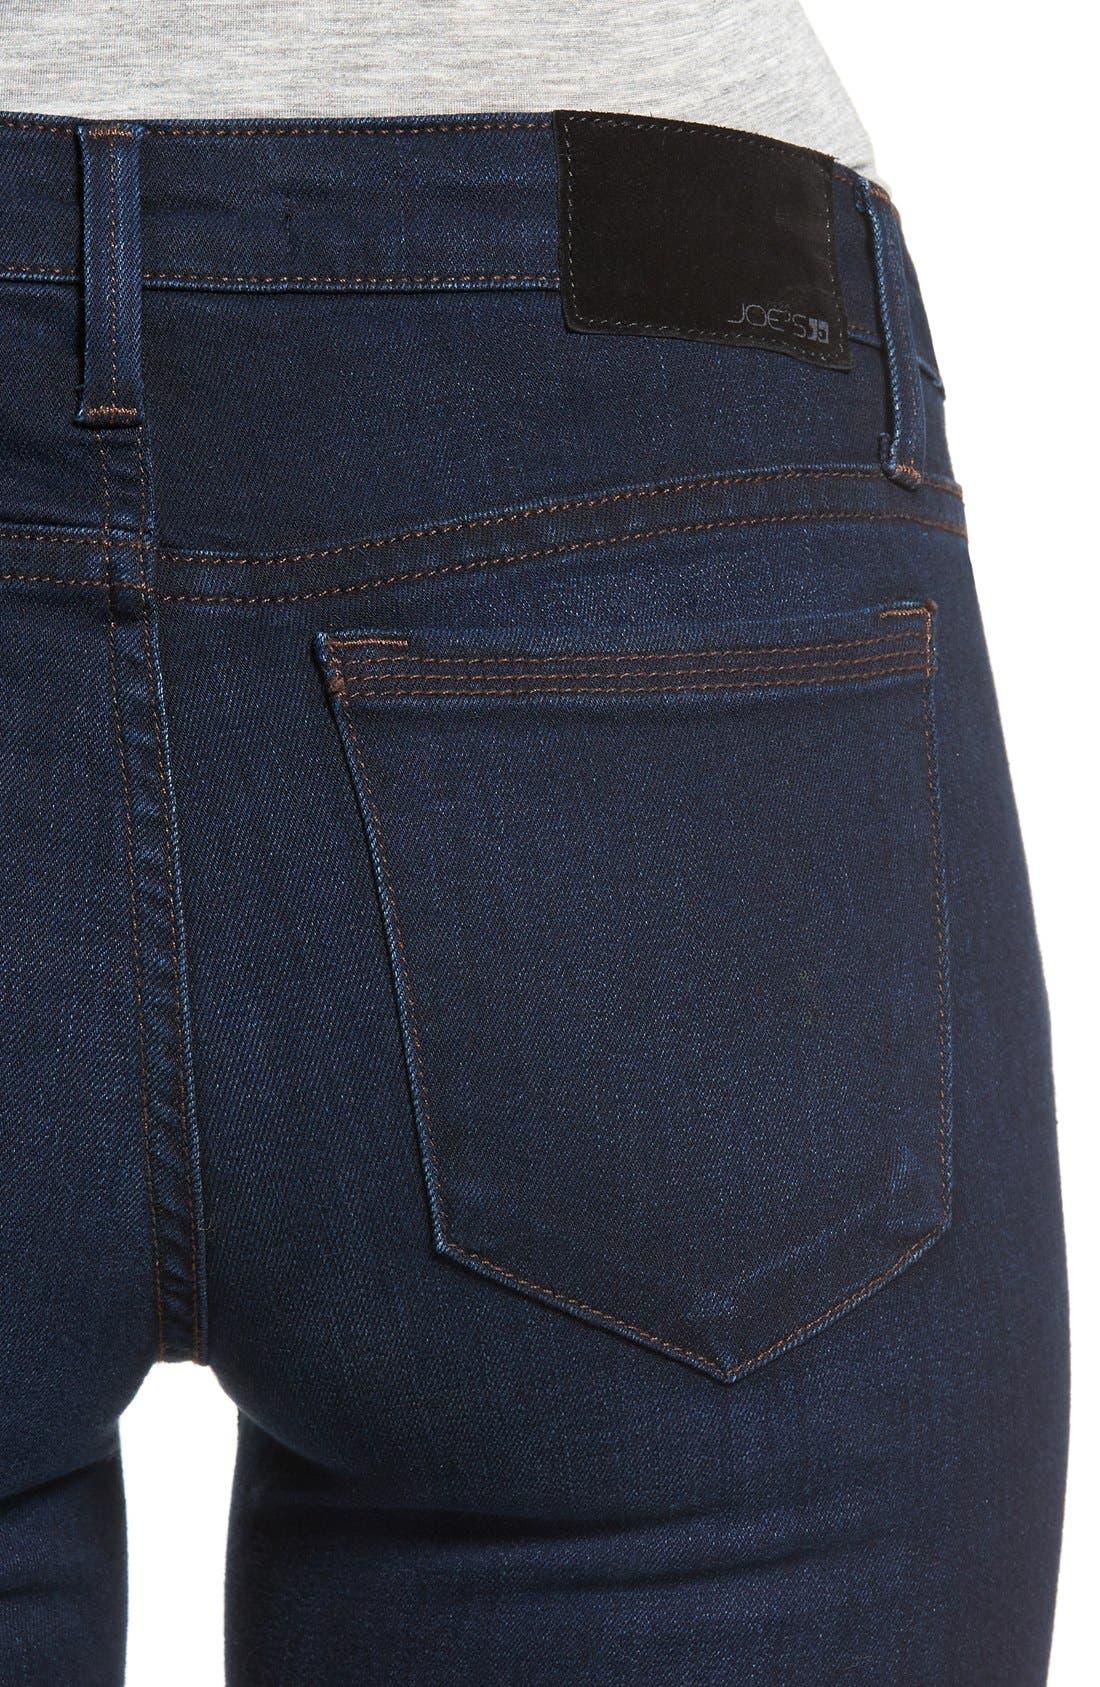 Alternate Image 4  - Joe's 'Flawless - Honey' Curvy Skinny Jeans (Selma)